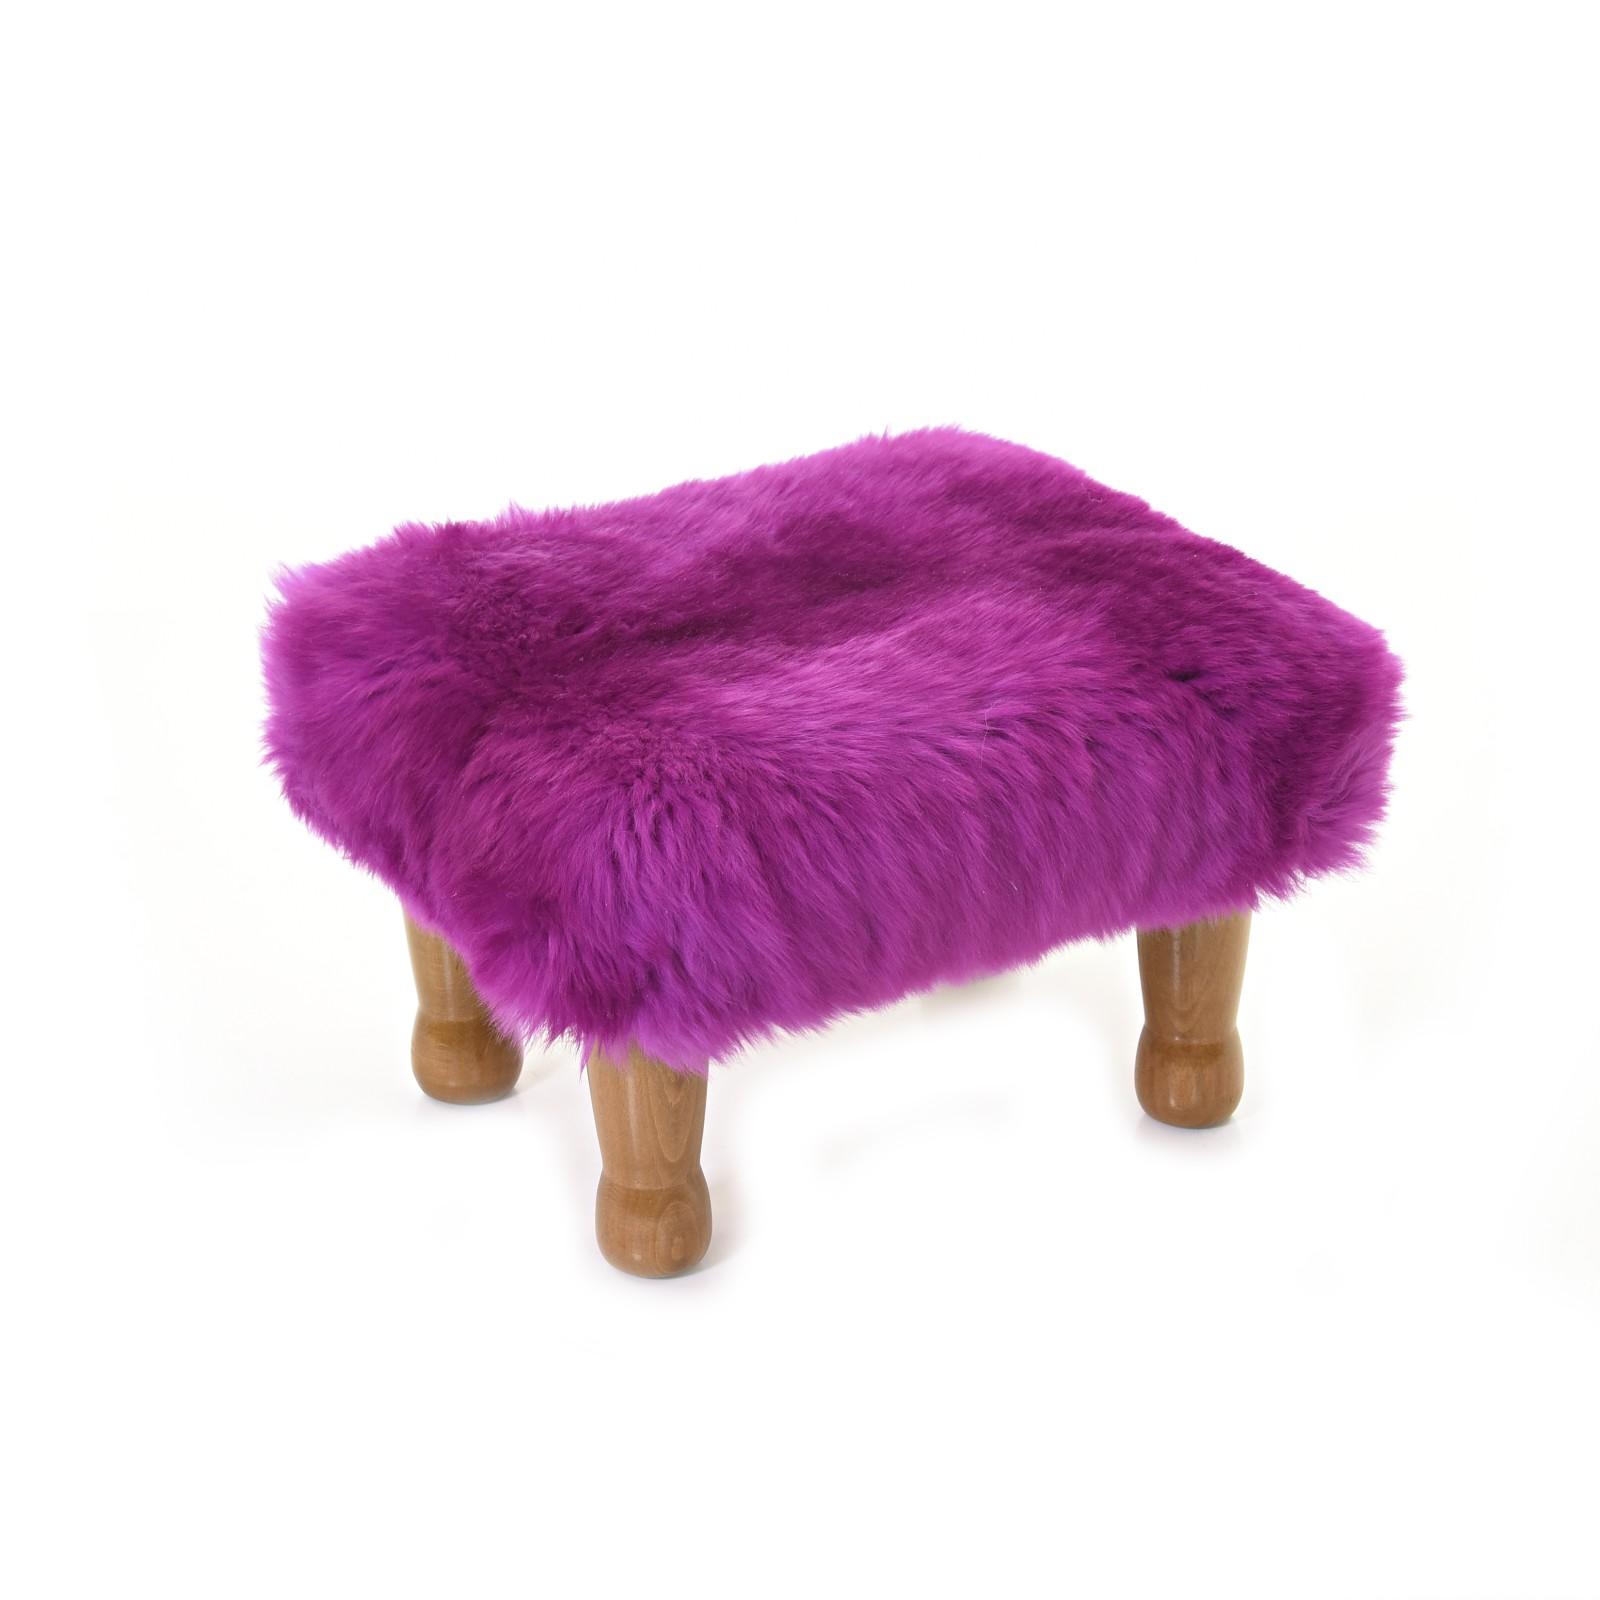 Anwen - Sheepskin Footstool Cerise